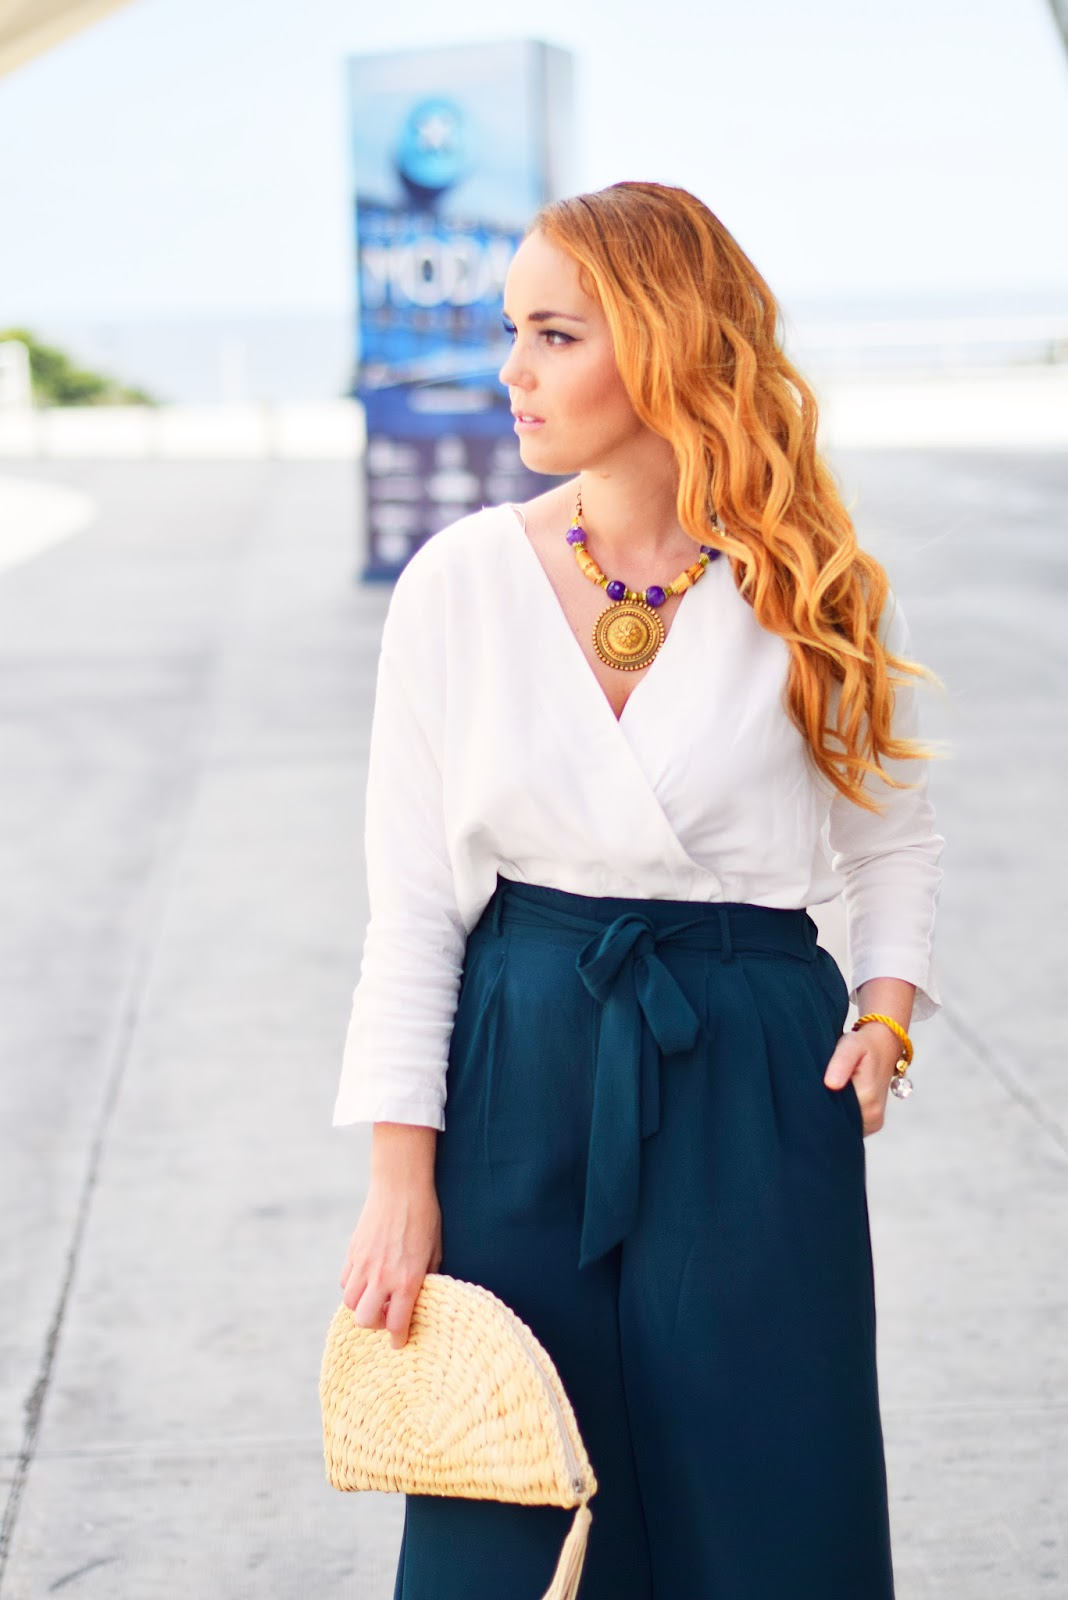 NERY HDEZ, pantalones culotte, feria moda tenerife, maharani by elisa salas